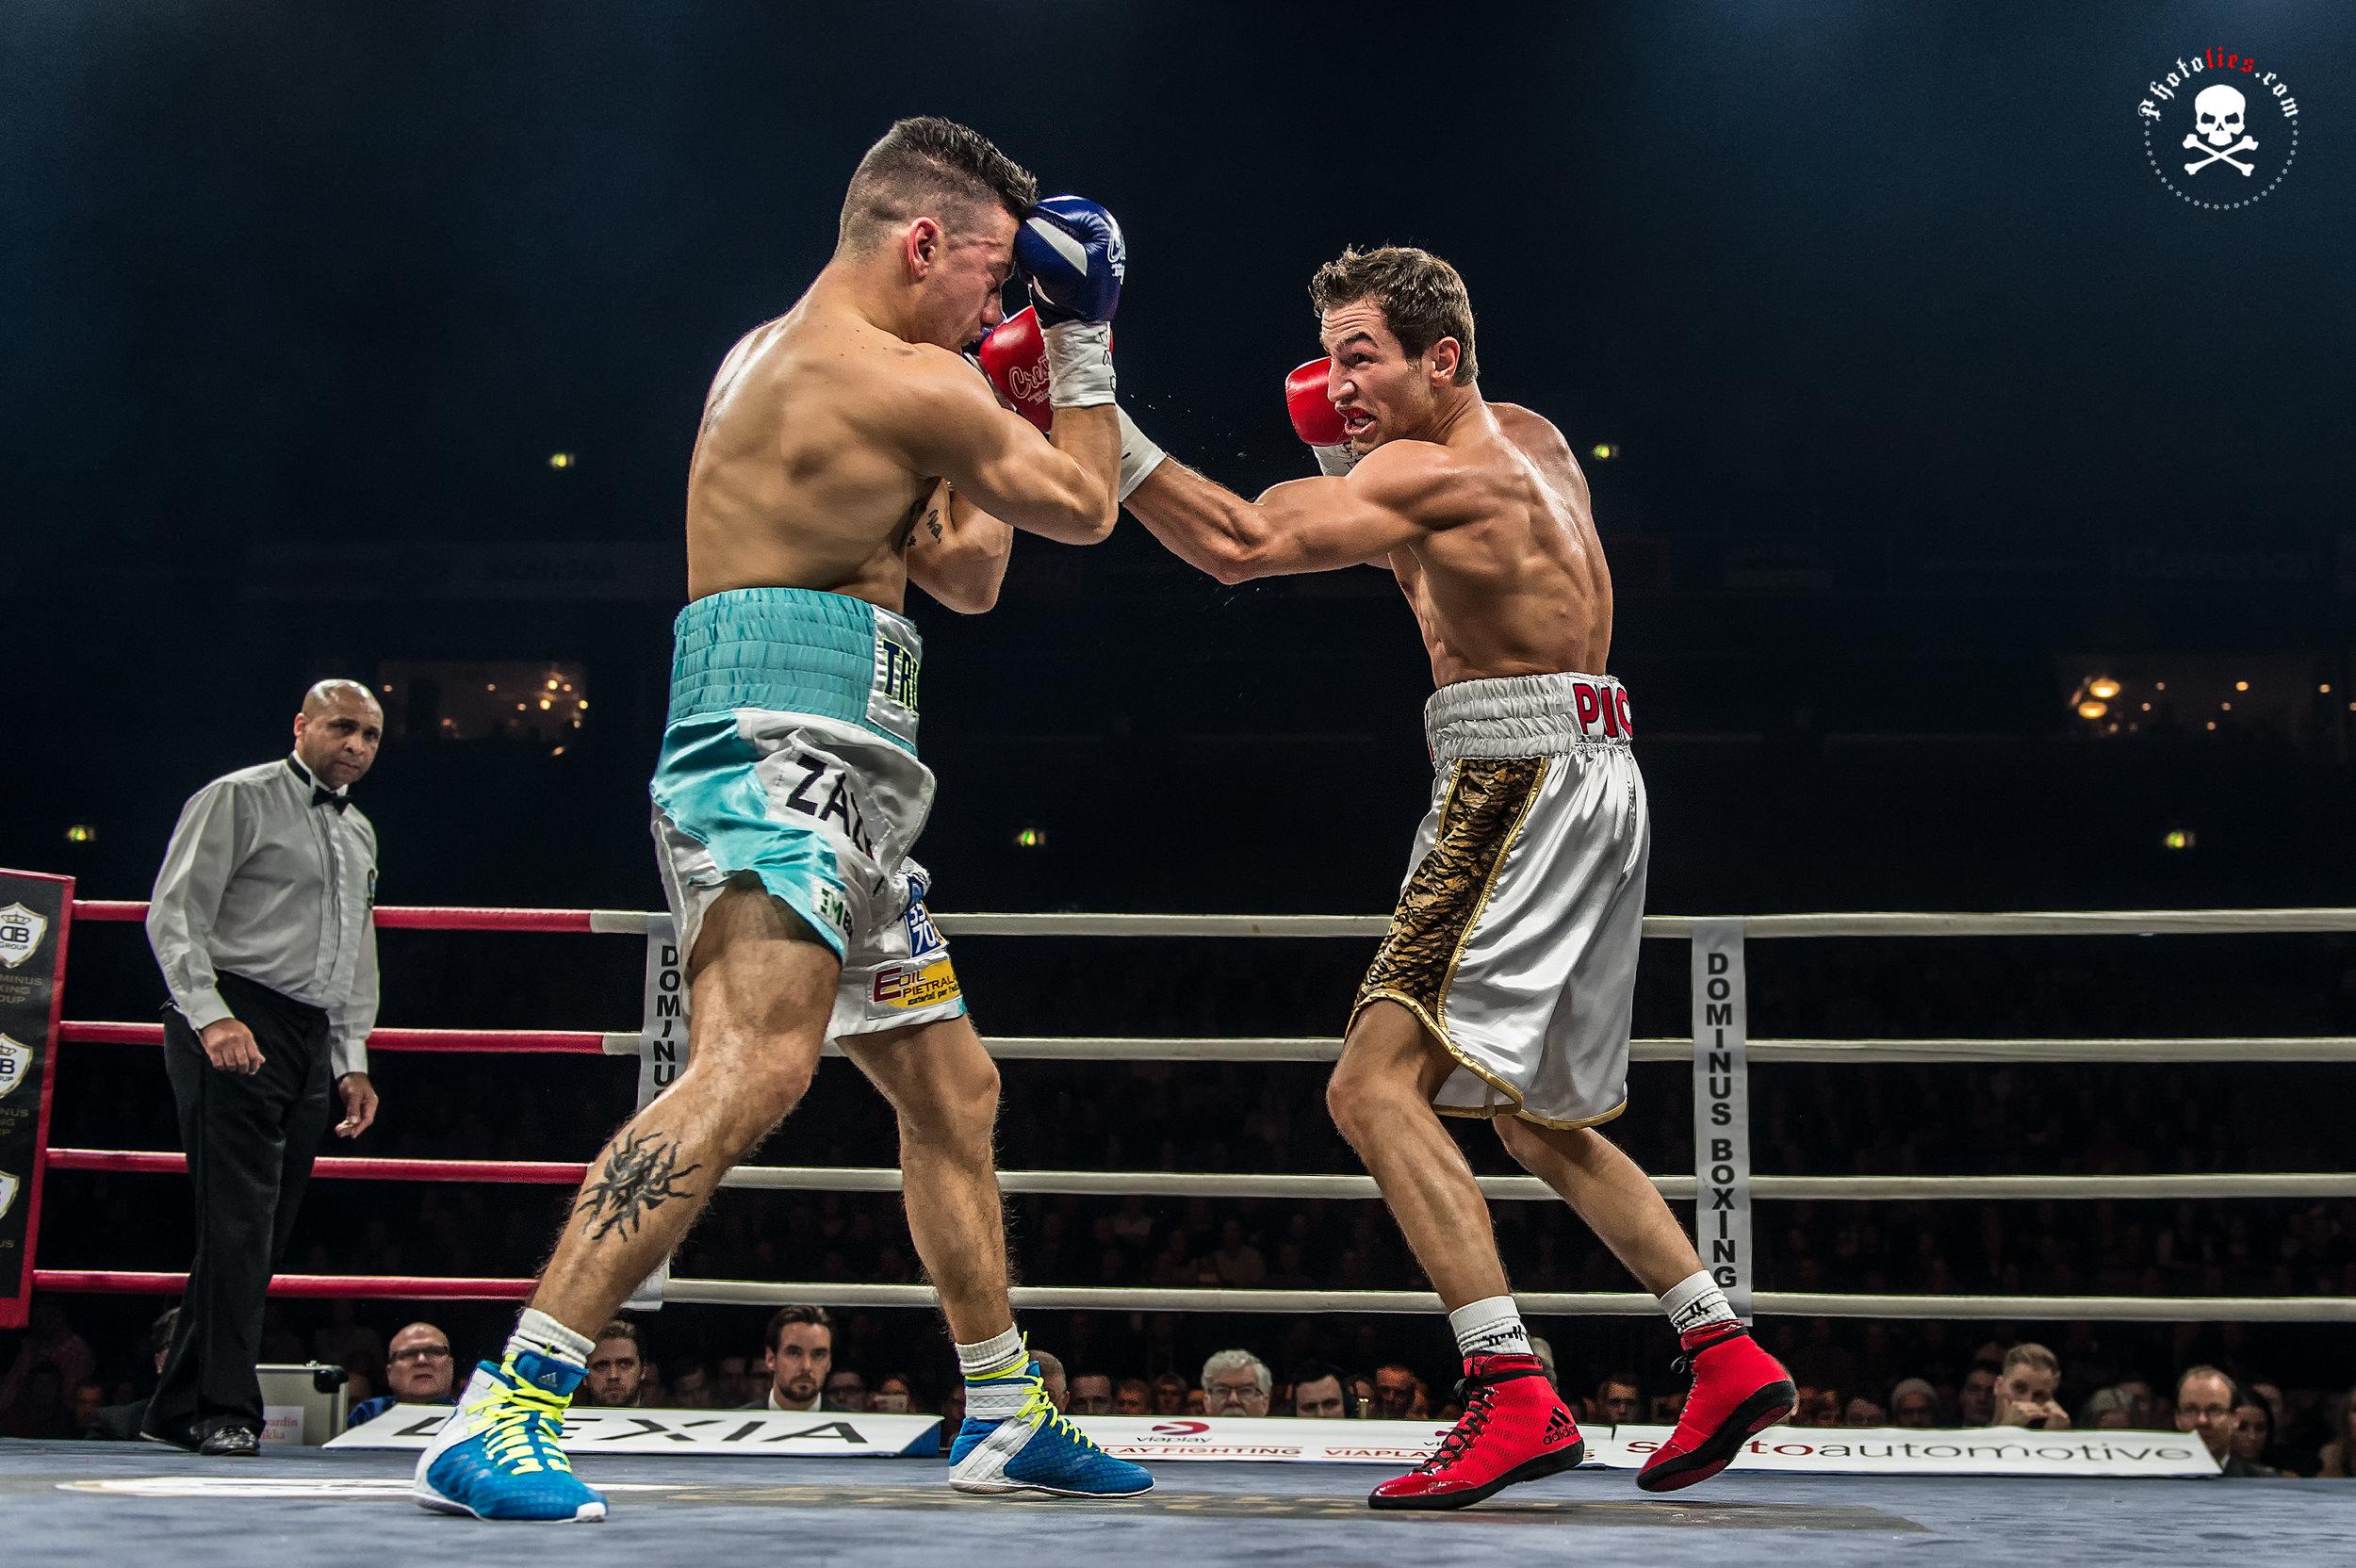 Edis Tatli vs. Manuel Lancia